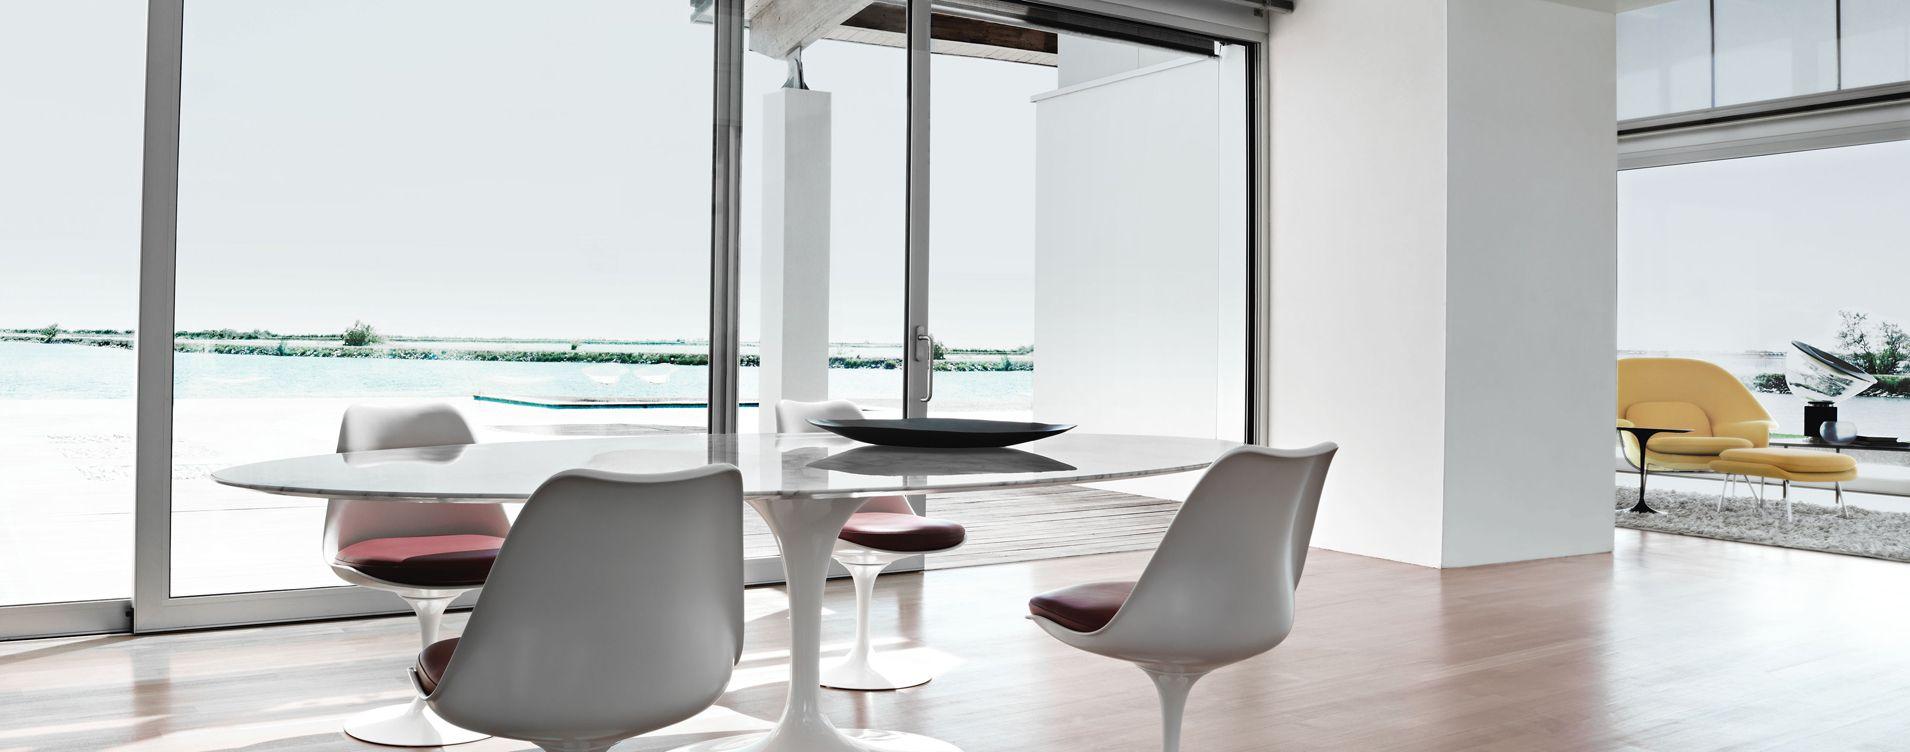 mobilier design et contemporain silvera. Black Bedroom Furniture Sets. Home Design Ideas